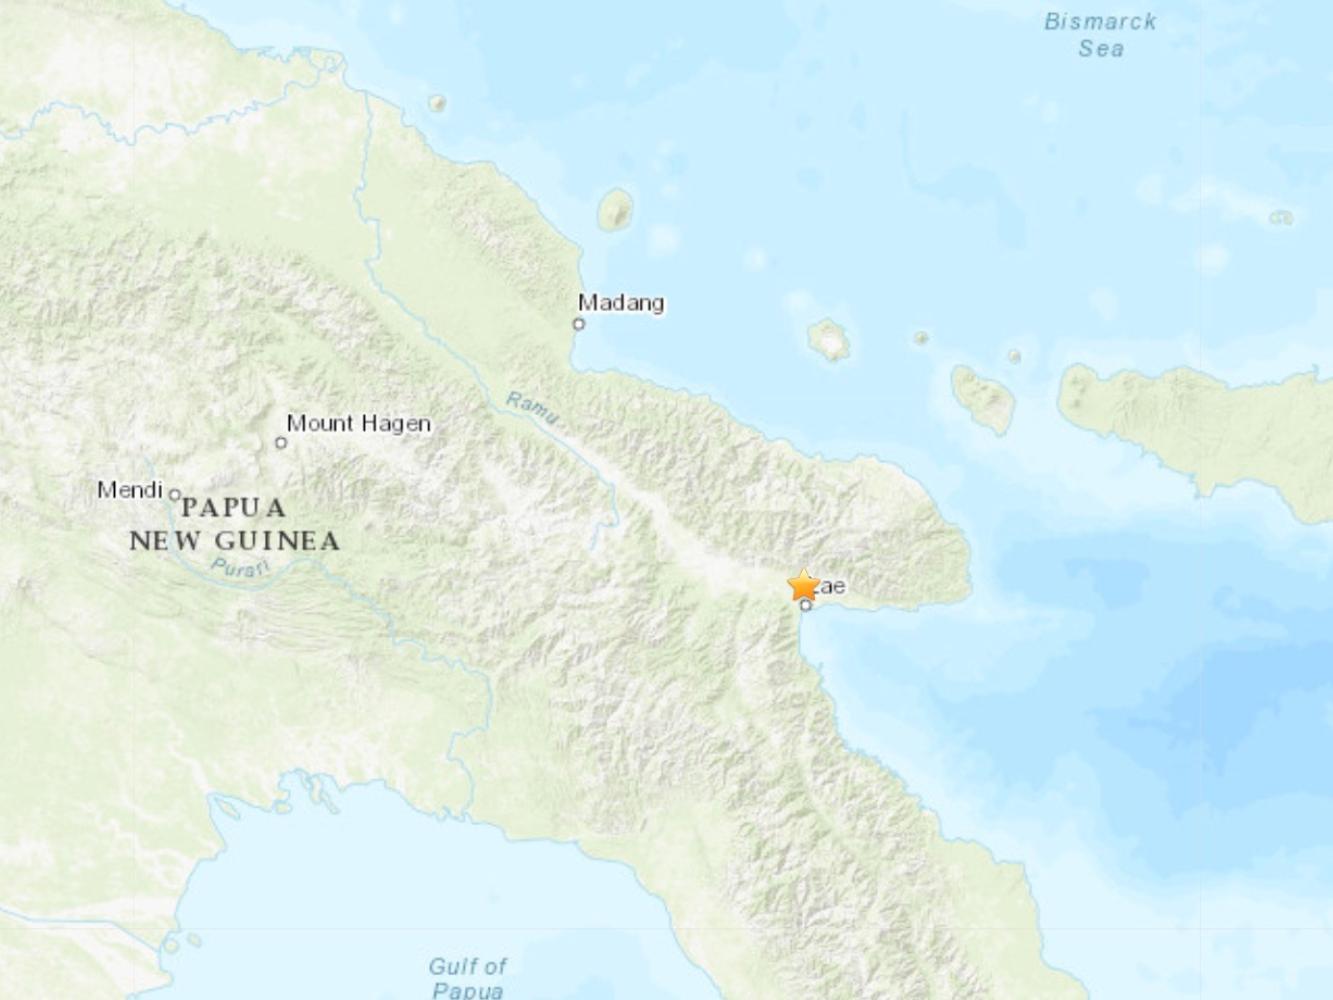 5.2-magnitude quake hits 14 km NW of Lae, Papua New Guinea: USGS